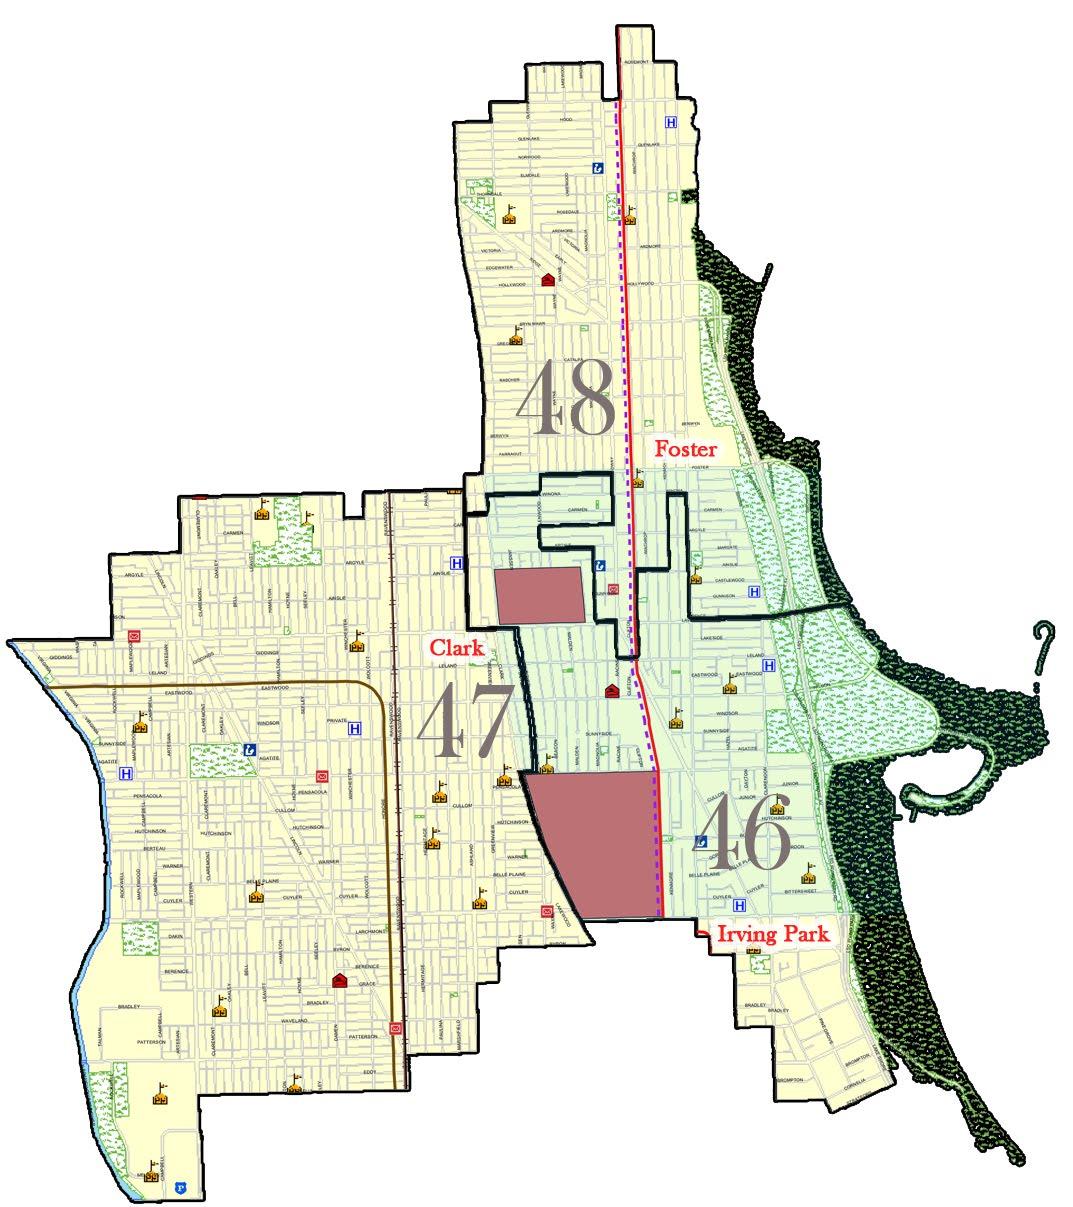 Uptown Update Fun With Maps - Chicago alderman map